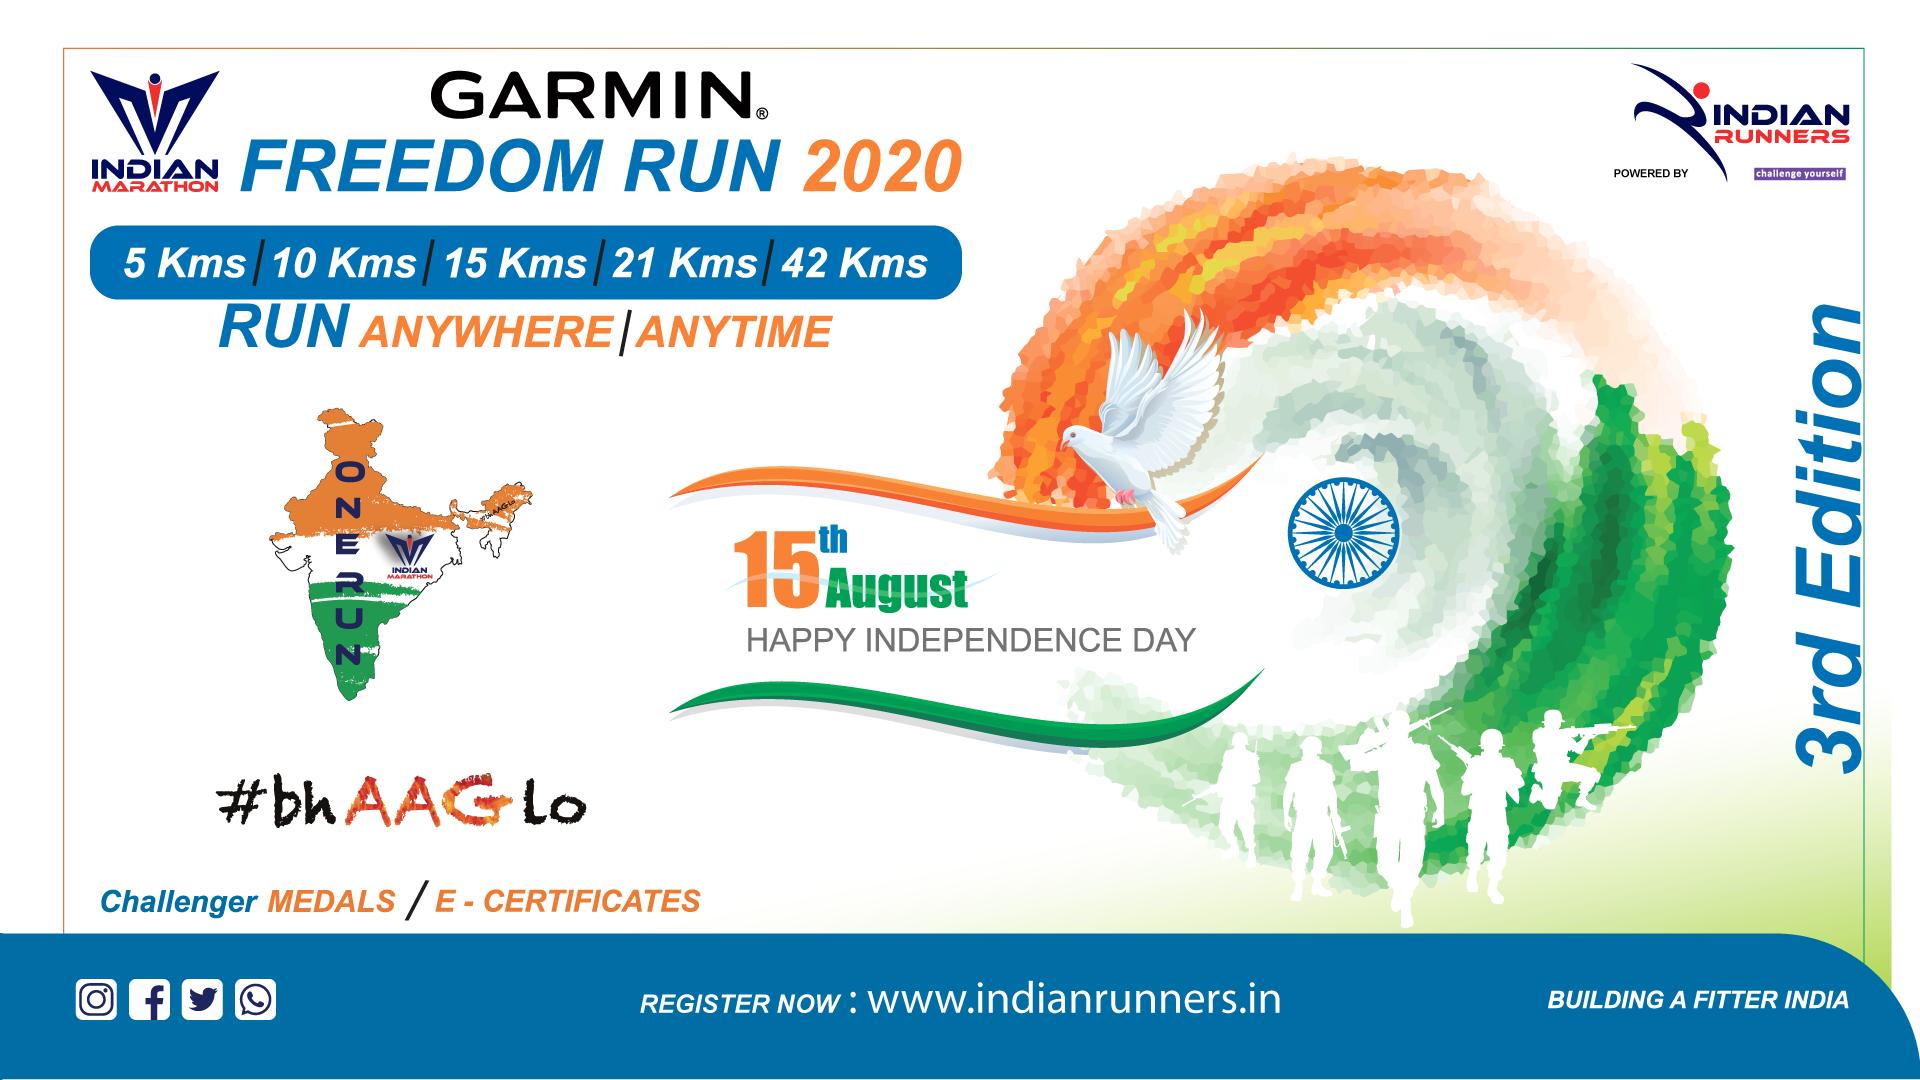 Garmin Freedom Run image